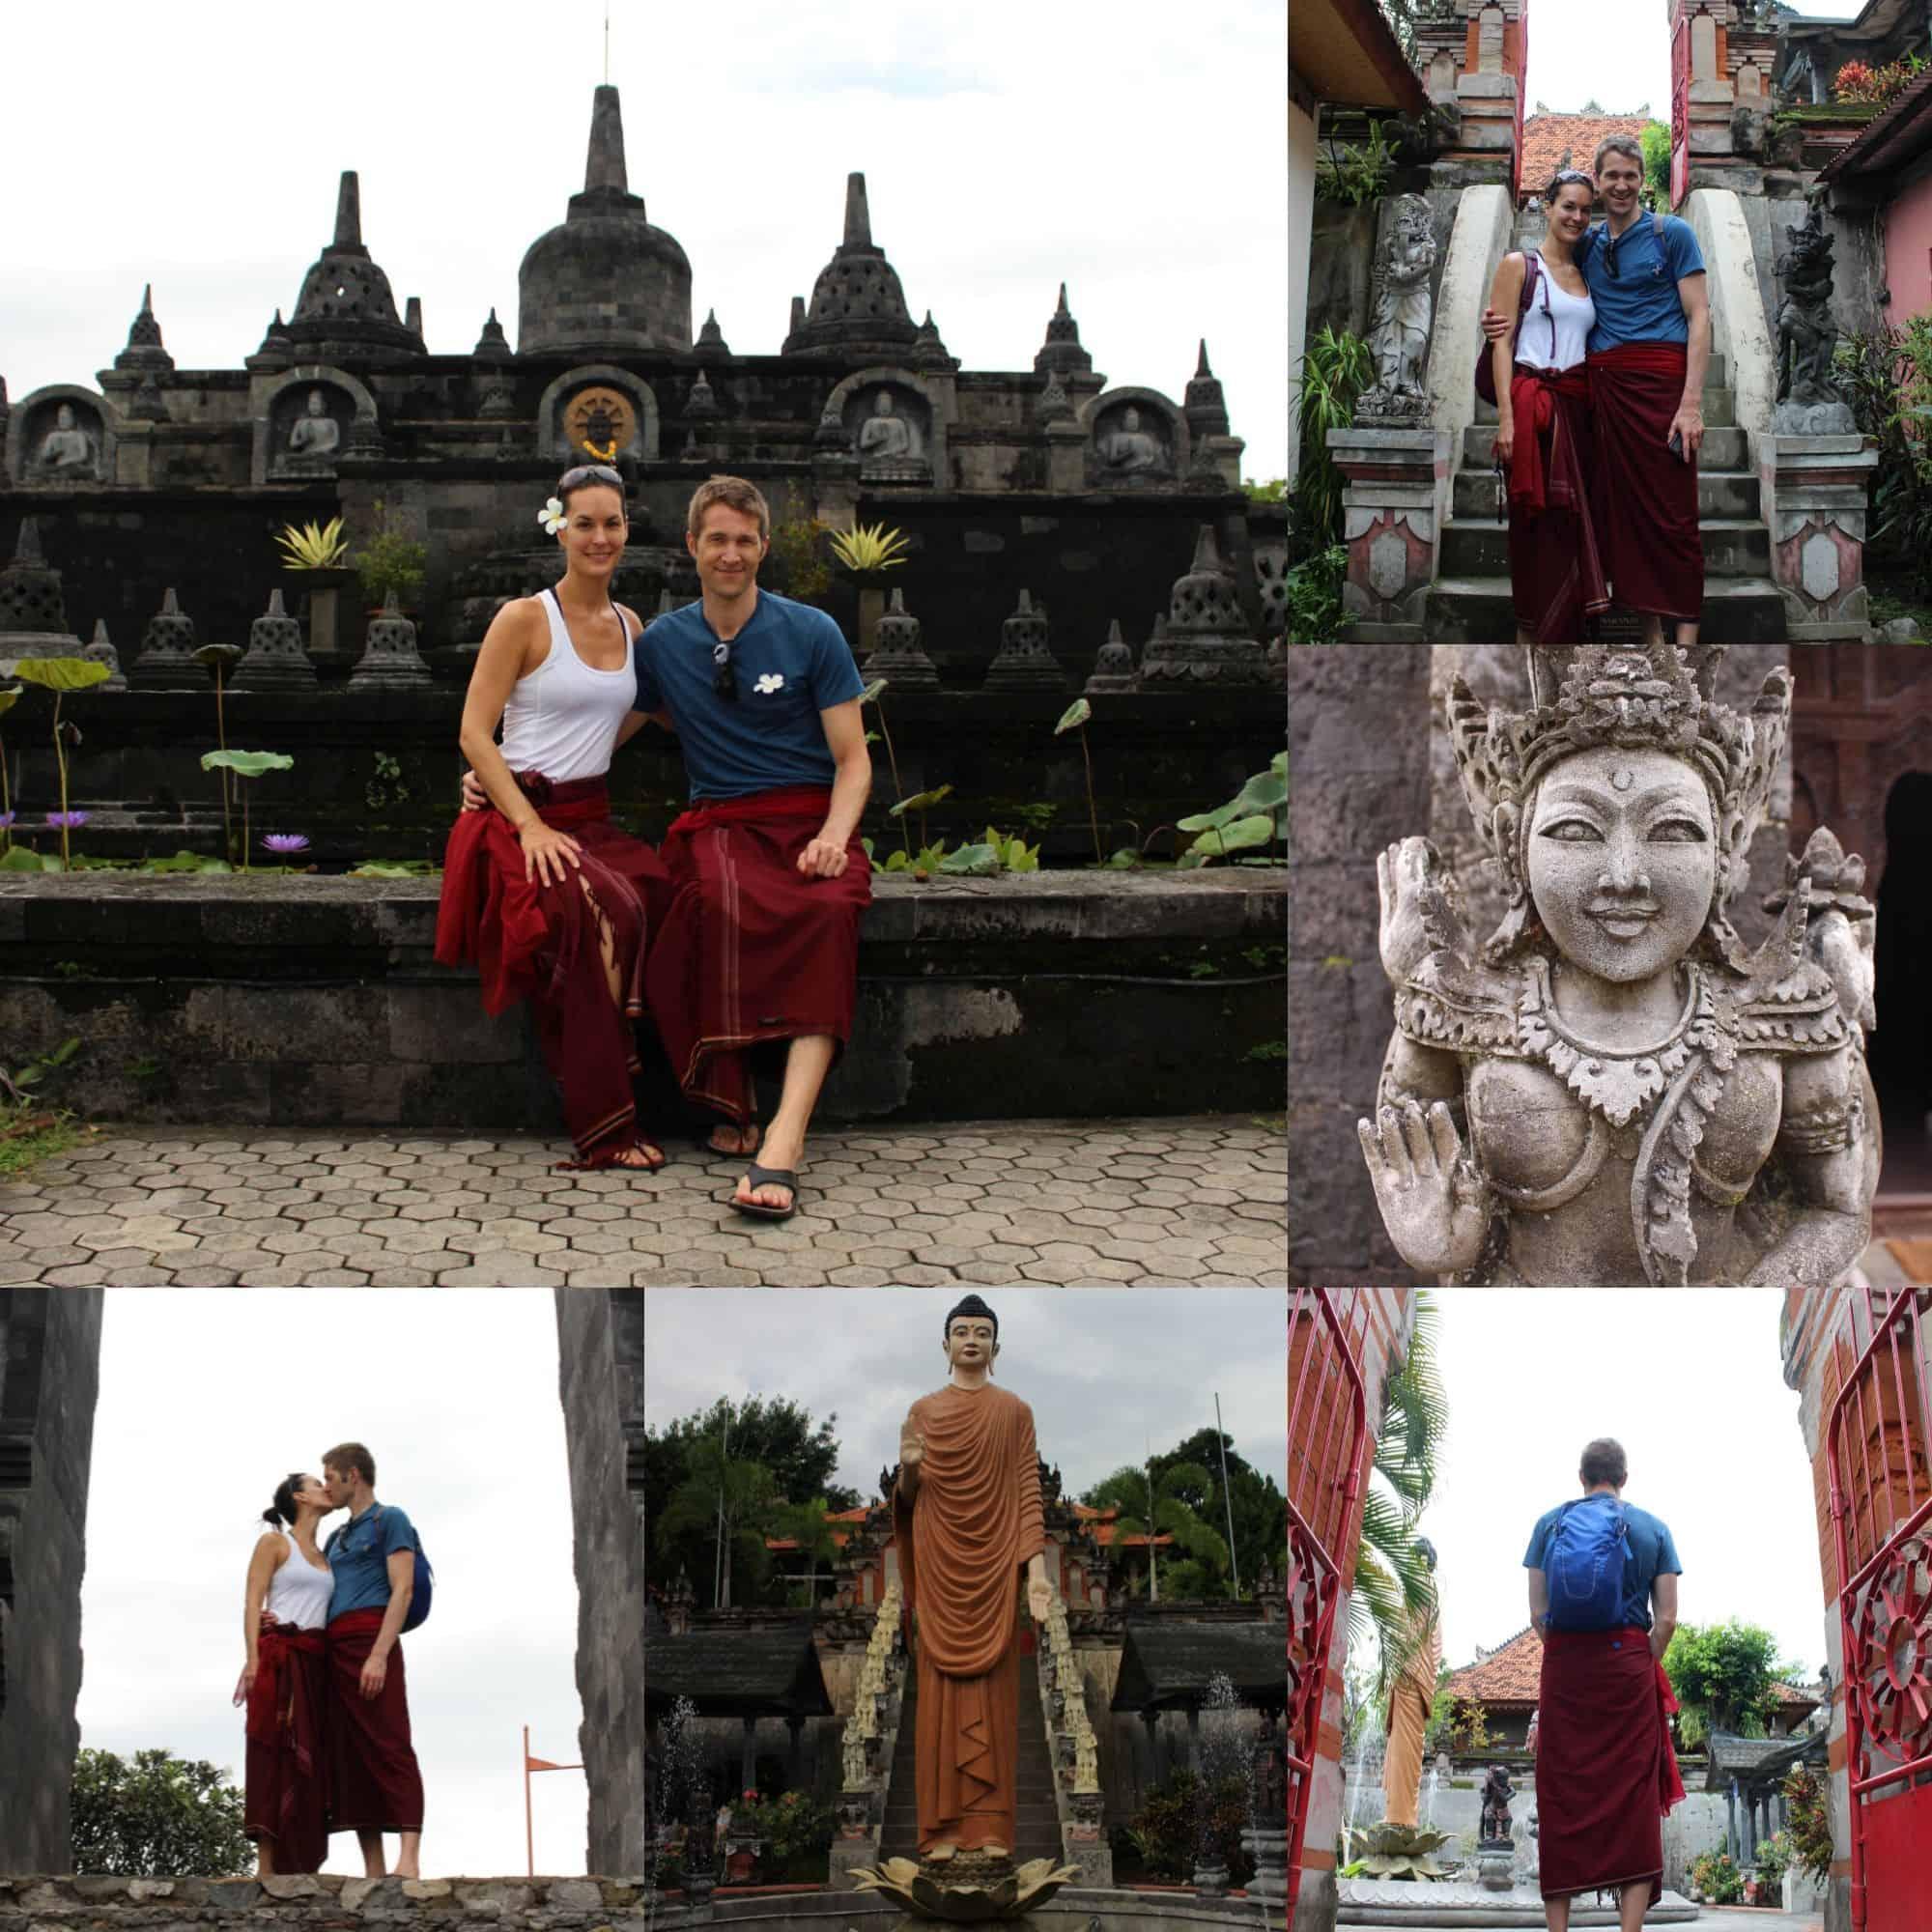 Le temple bouddhiste«Brahma Arama Vihara»